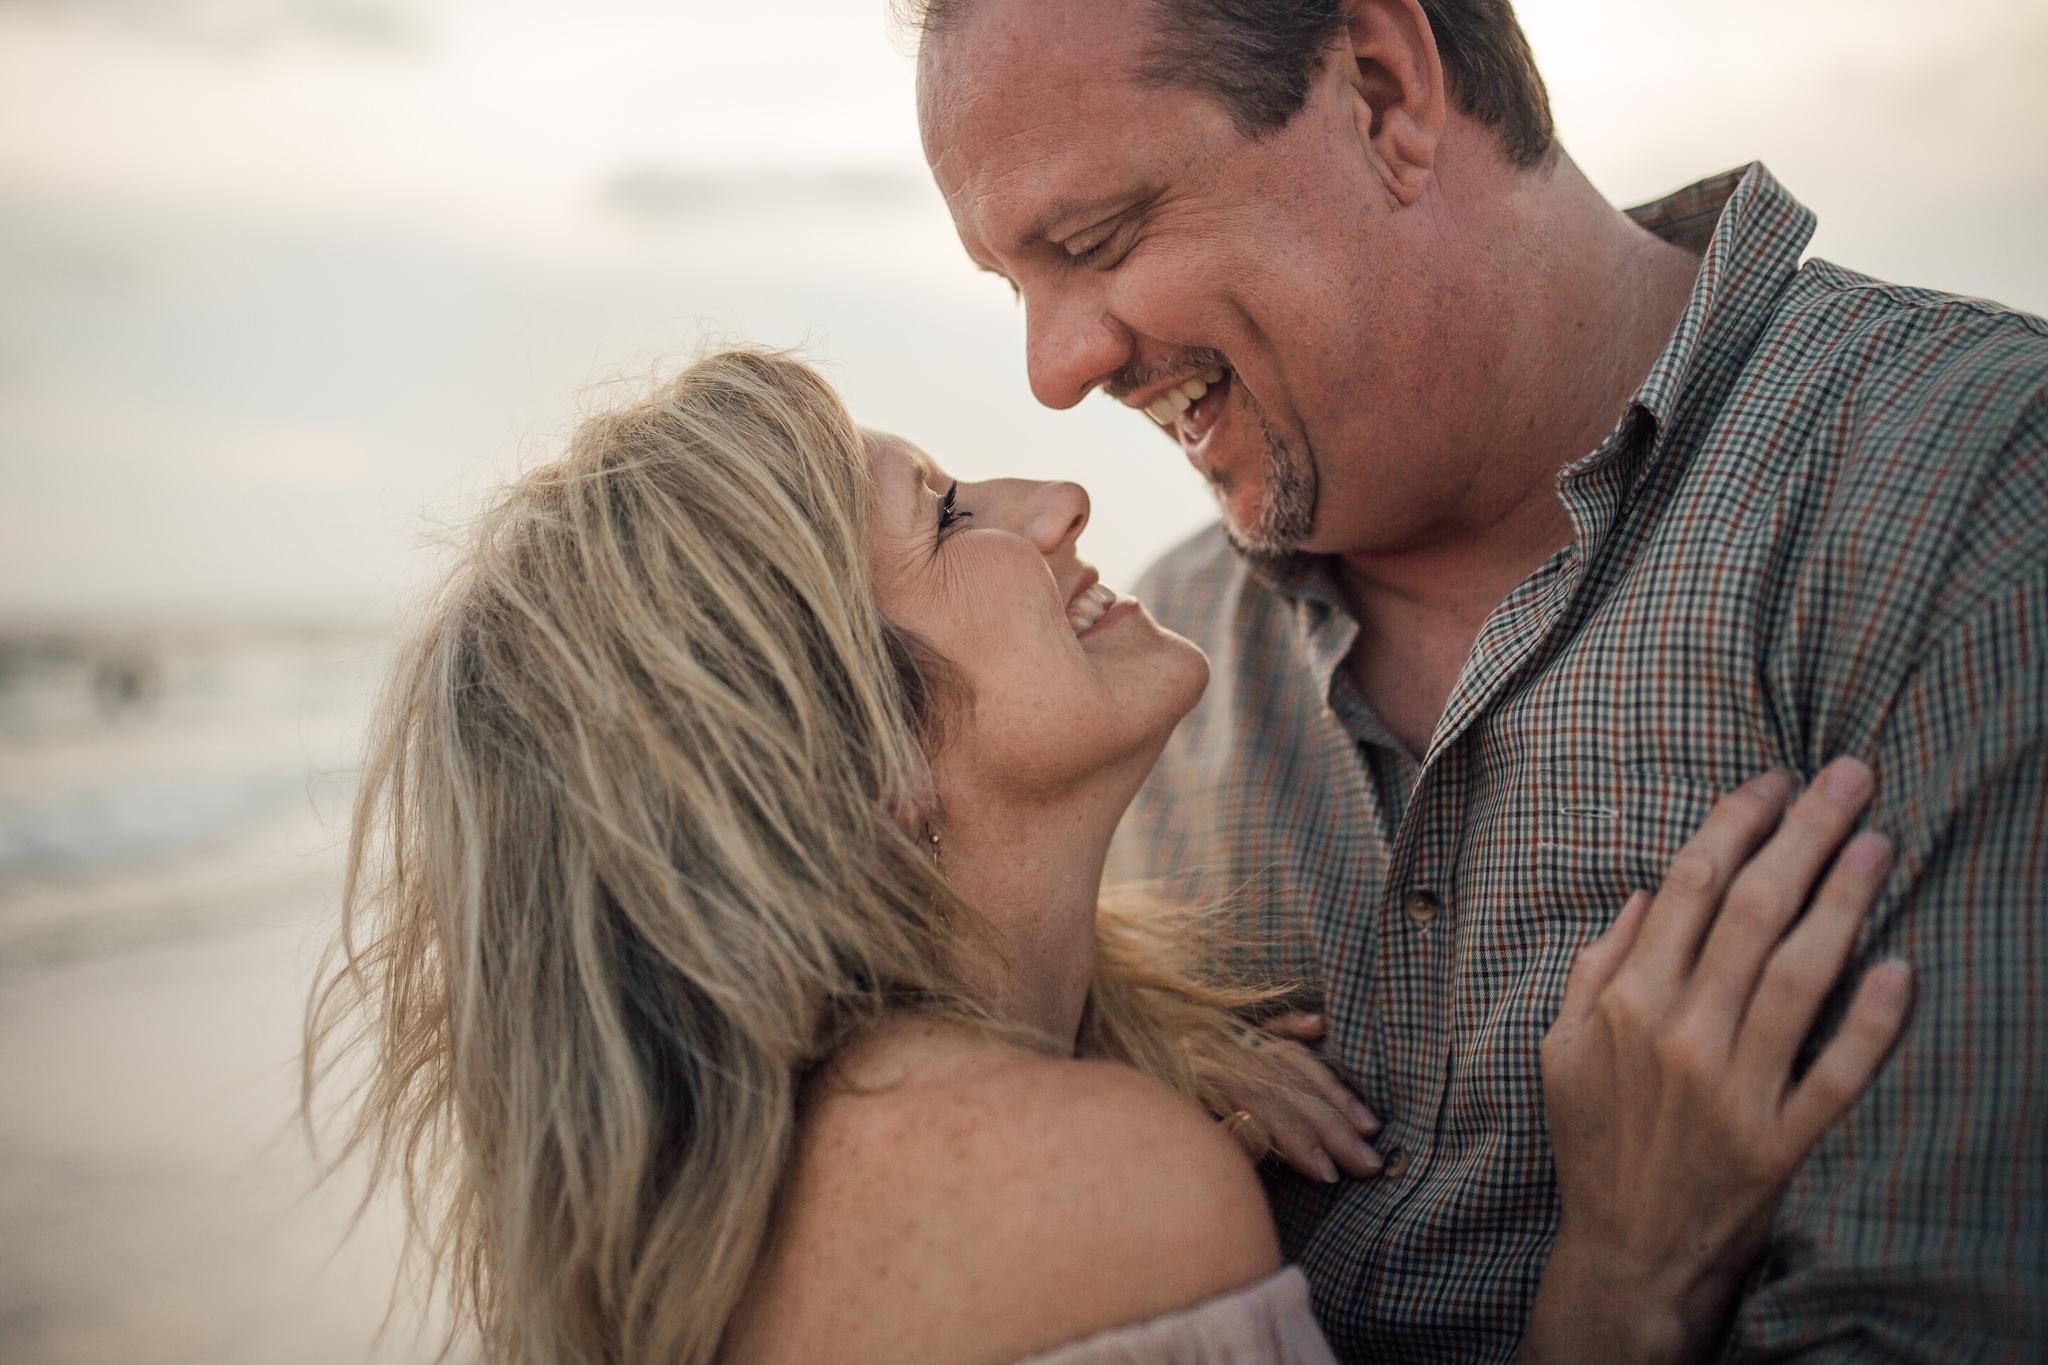 cassie-cook-photography-santa-rosa-beach-florida-couples-session-beach-photography-550.jpg